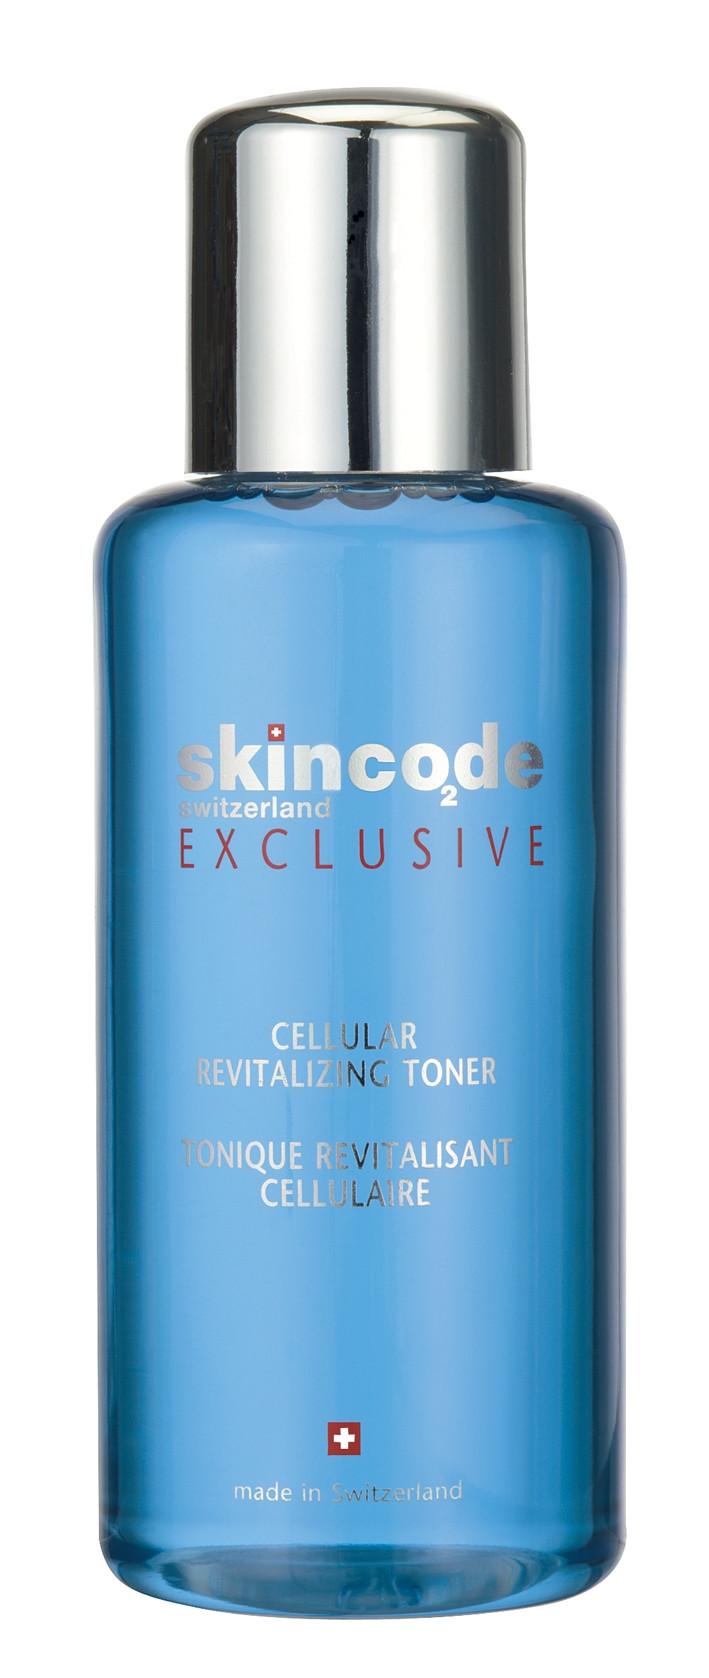 СКИНКОД ЕКСКЛУЗИВ Клетъчен ревитализиращ тоник 200мл | SKINCODE EXCLUSIVE Cellular revitalizing toner 200ml